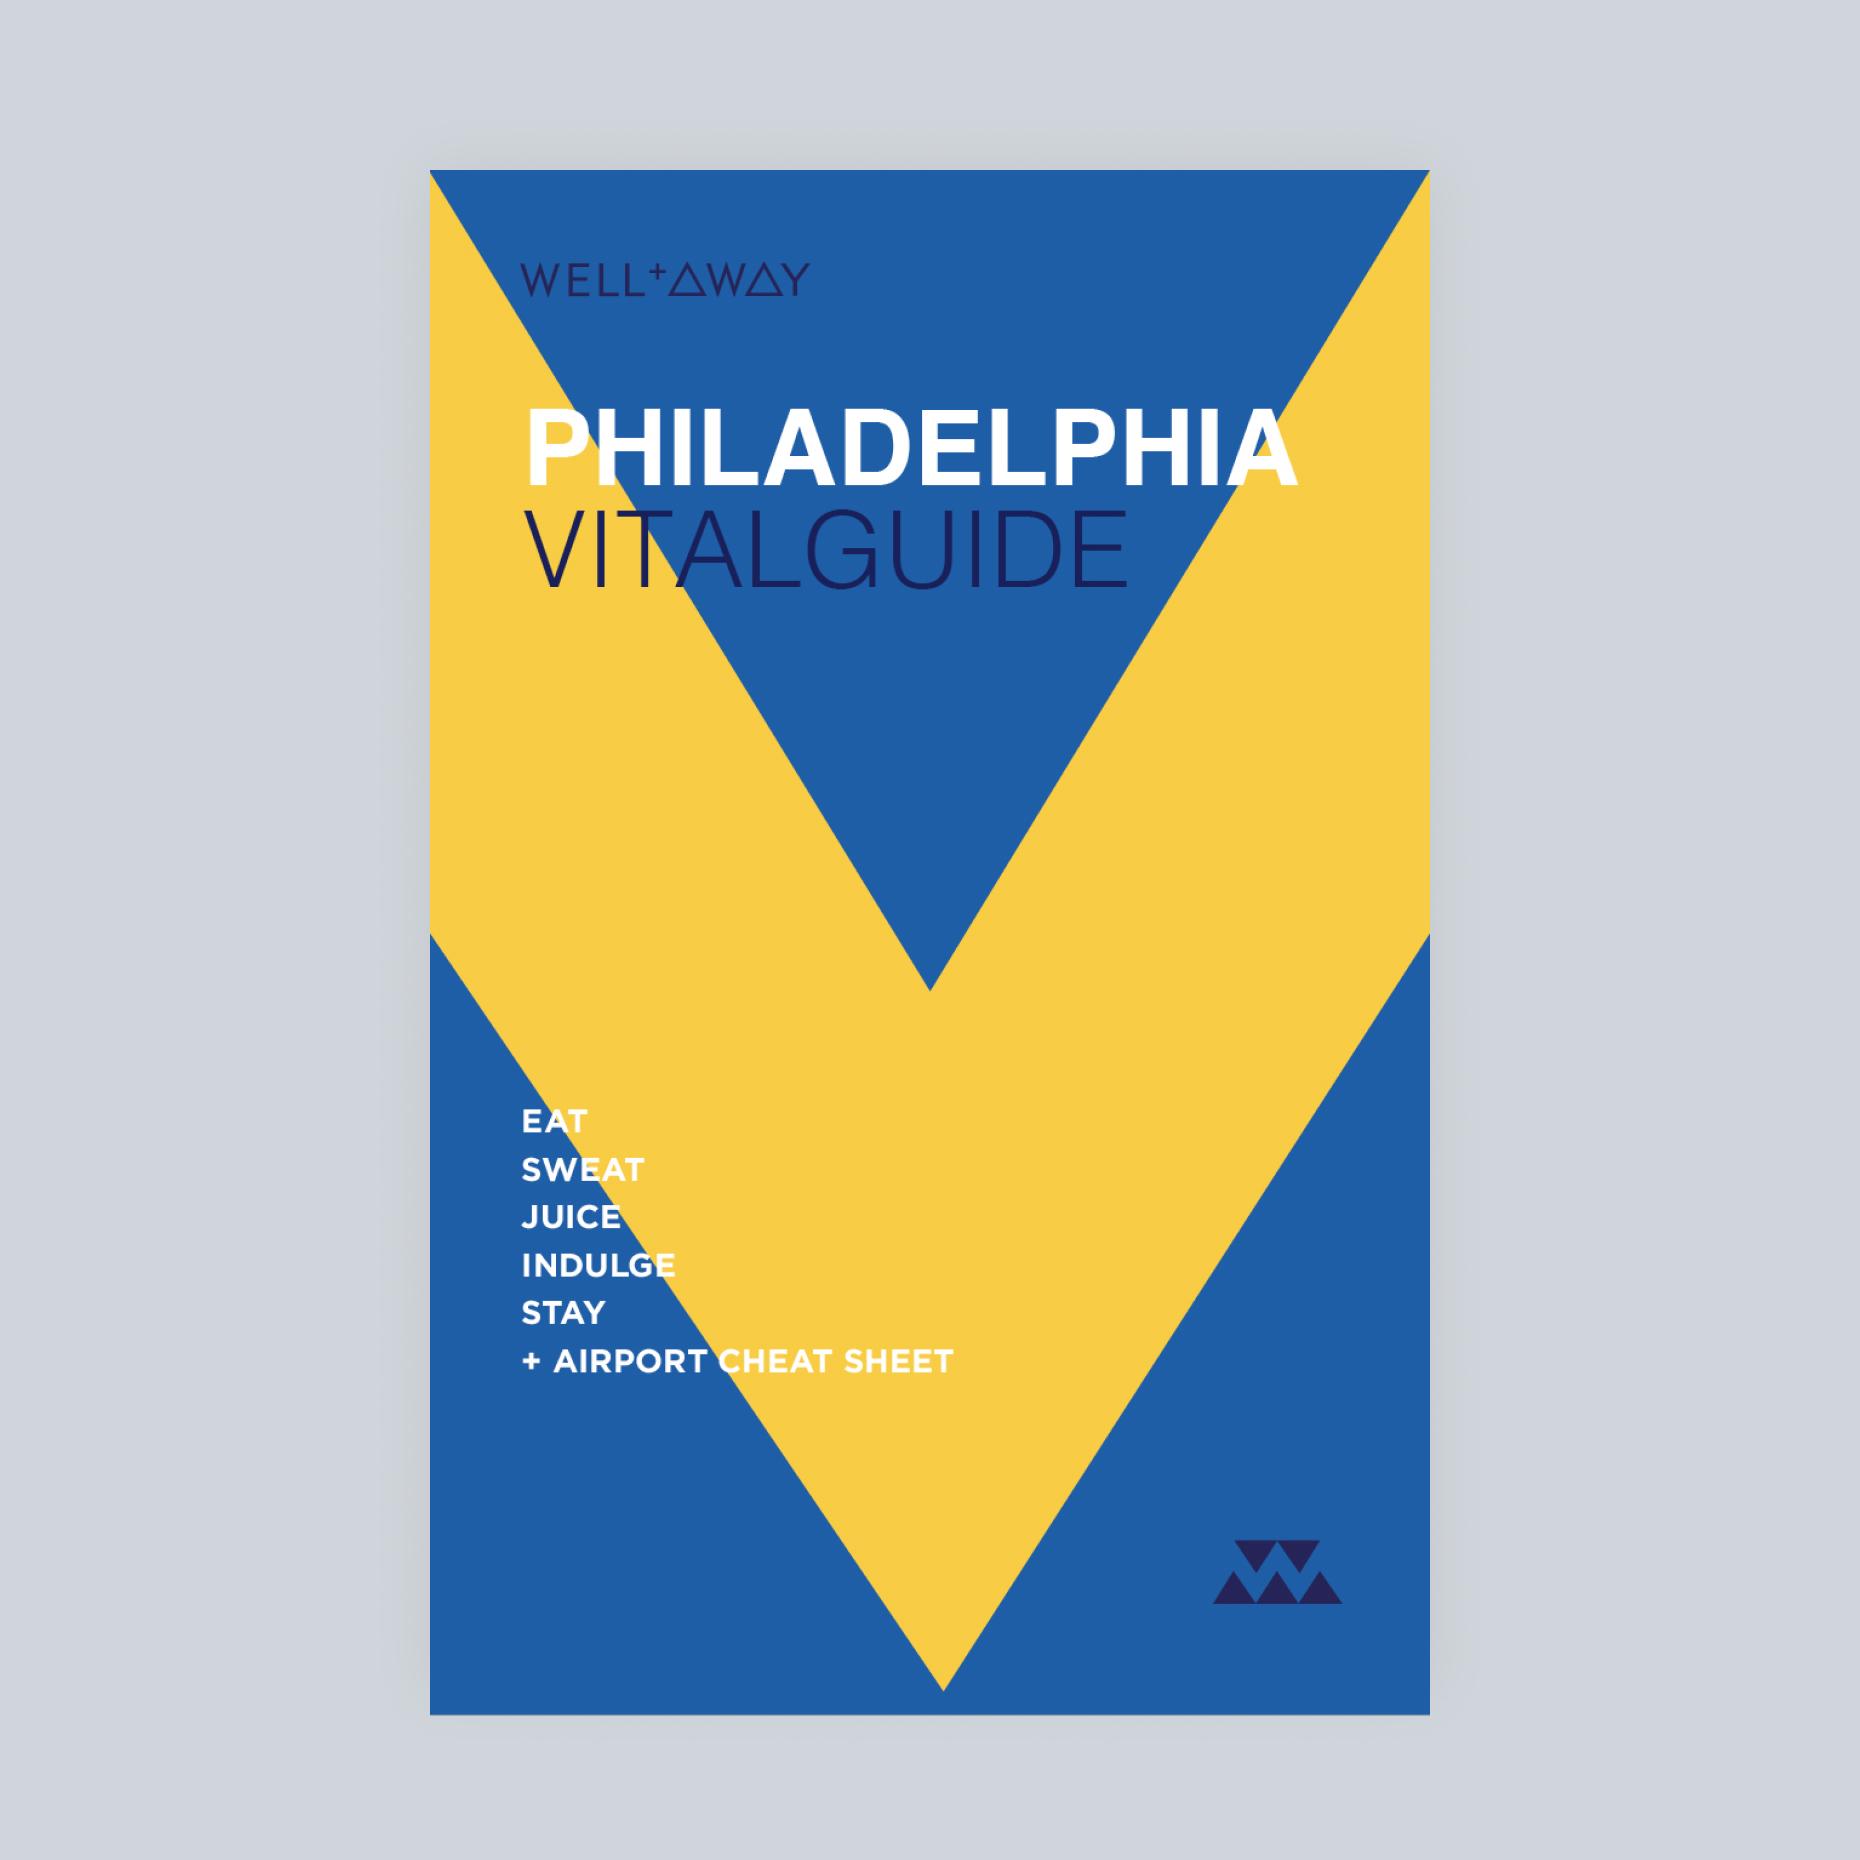 Philadelphia VitalGuide, 1st edition